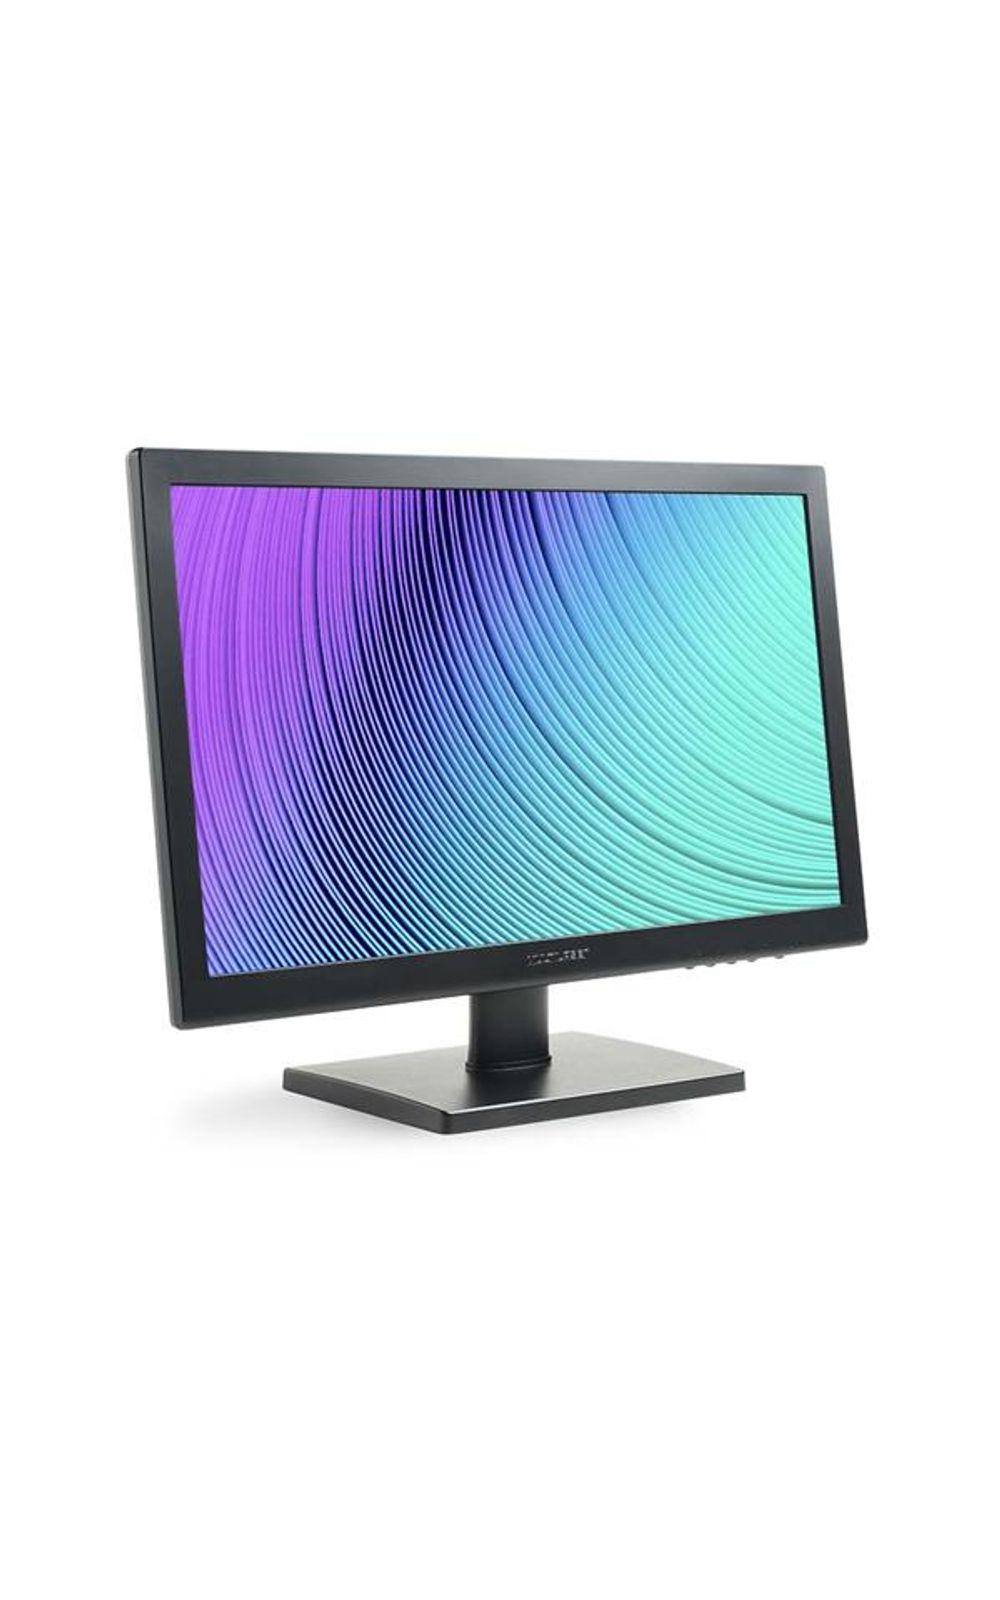 Foto 2 - Computador Multilaser Linux com Monitor 18.5 Pol Preto - DT016